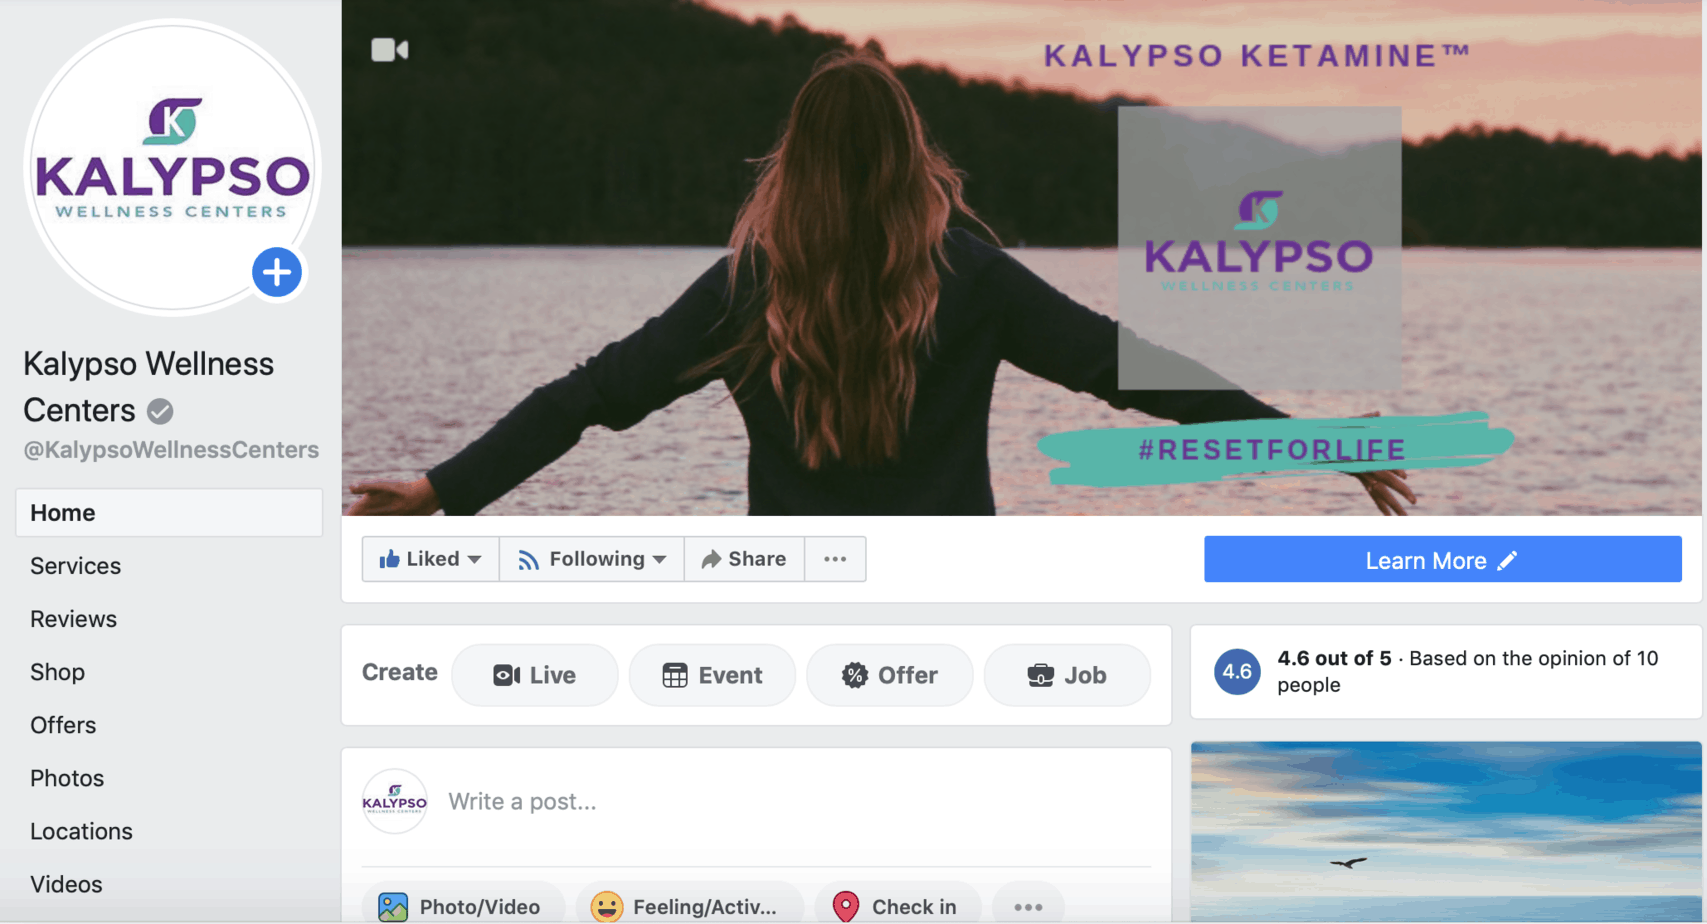 Kalypso Wellness Facebook